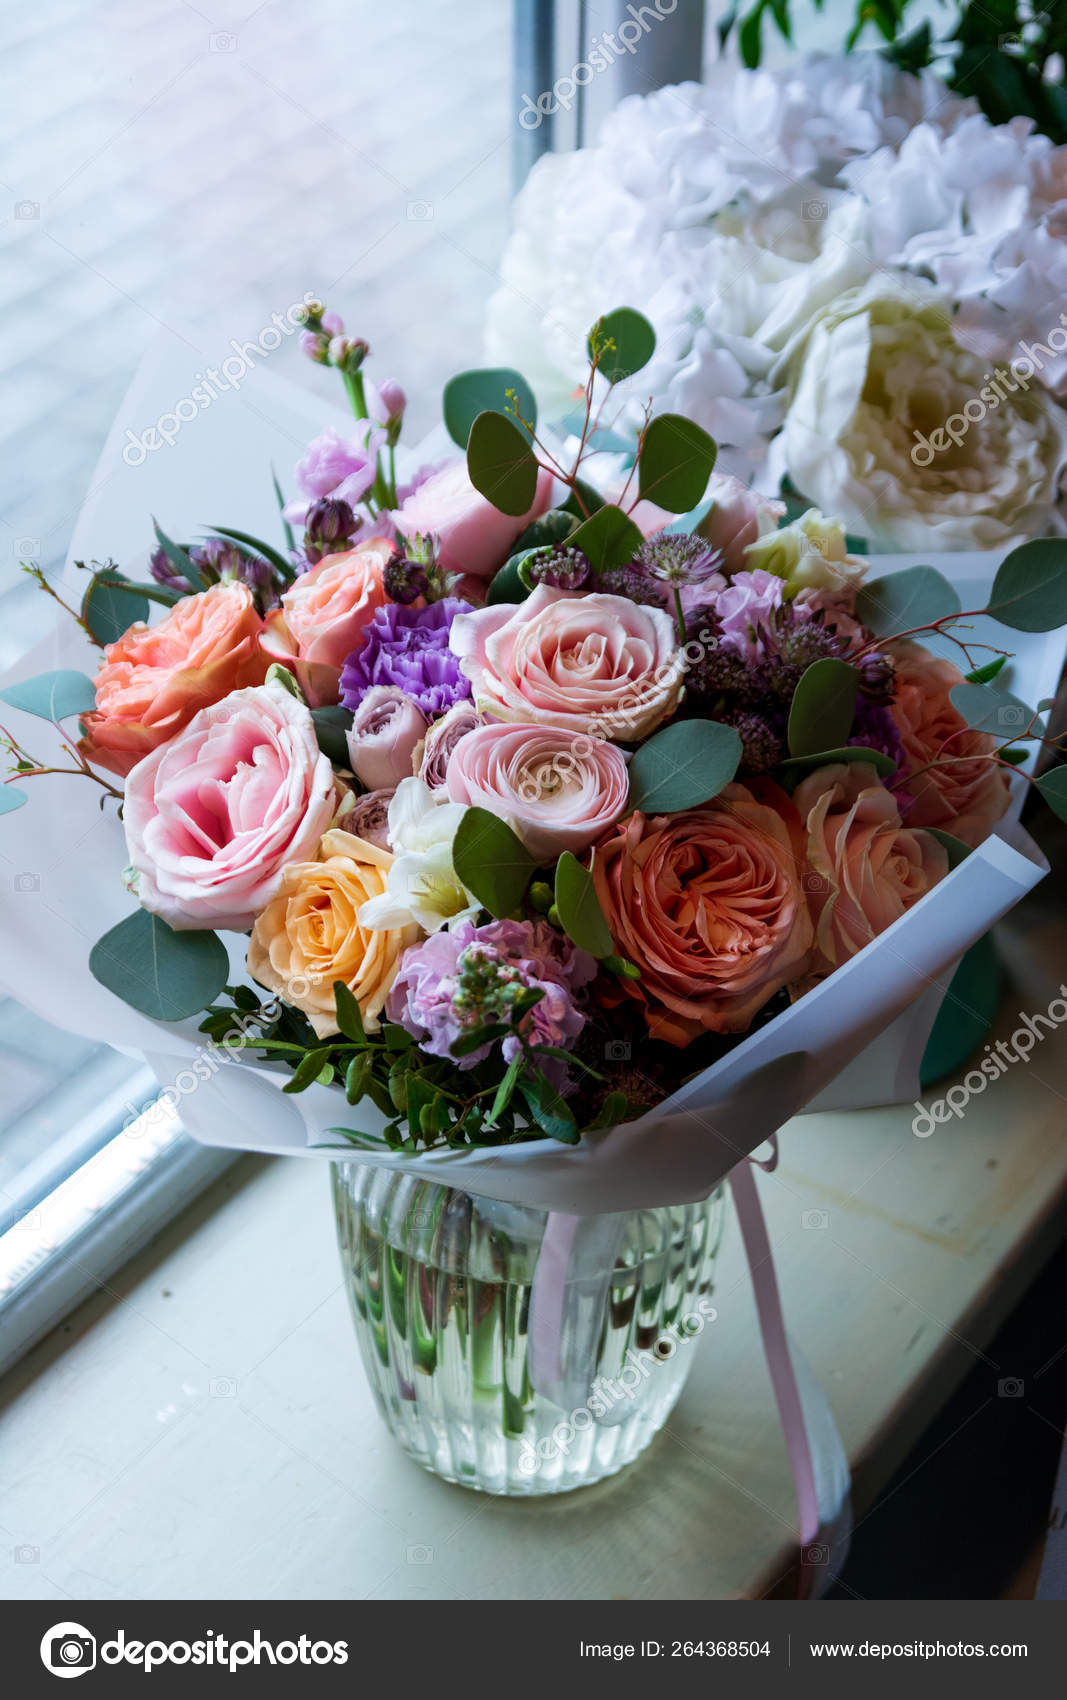 Bouquet Flowers Wedding Salon Roses Anemone Tulip Ranunculus Sunflower Garden Stock Photo C Plan905 264368504